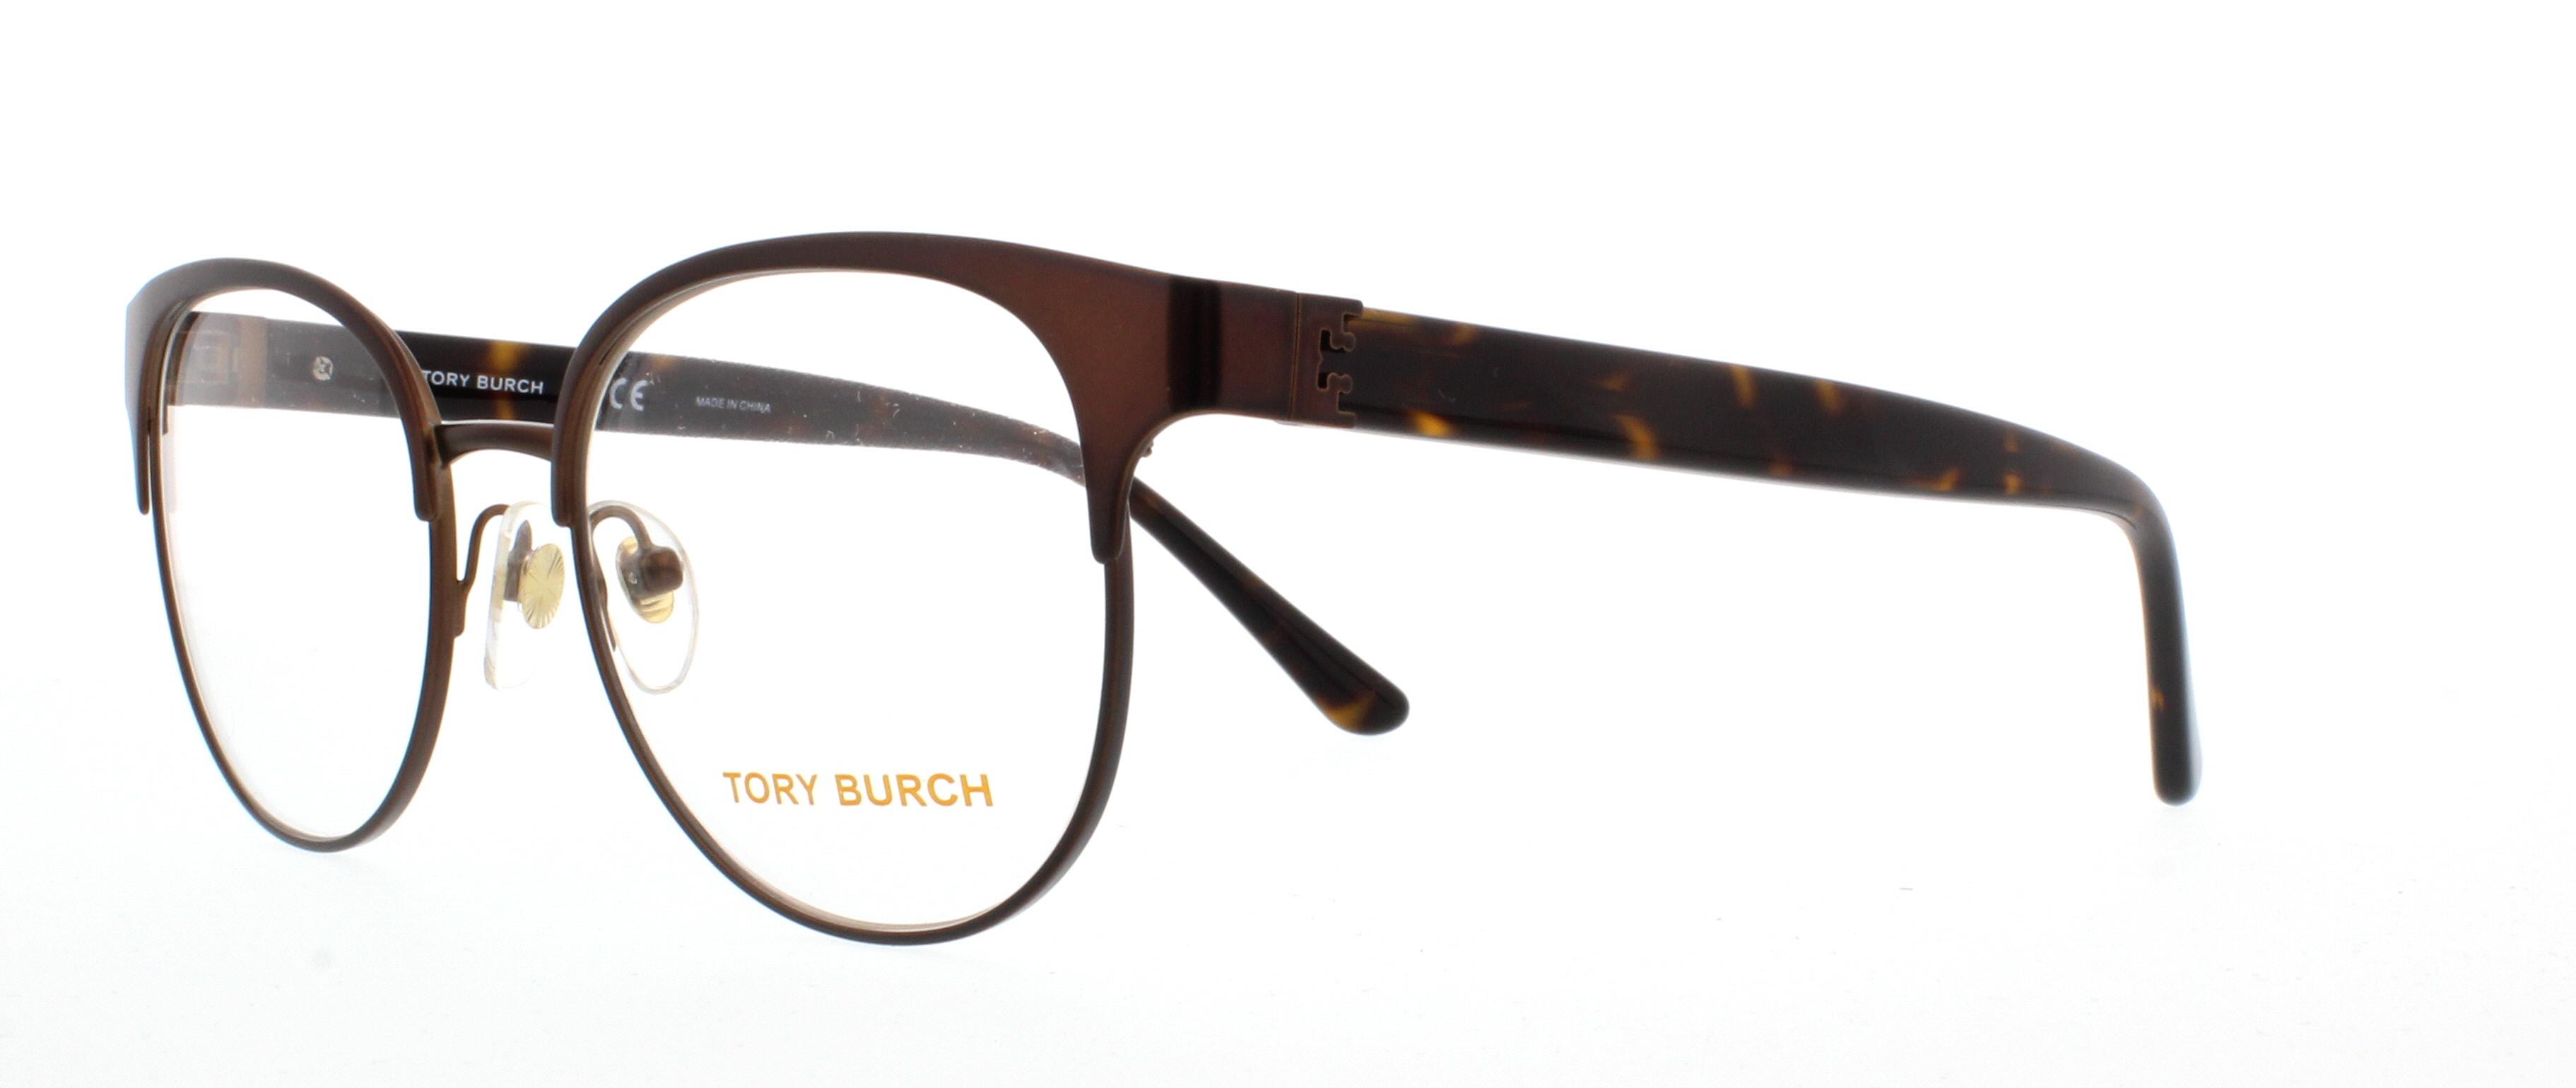 b7920262a5 Designer Frames Outlet. Tory Burch TY1054